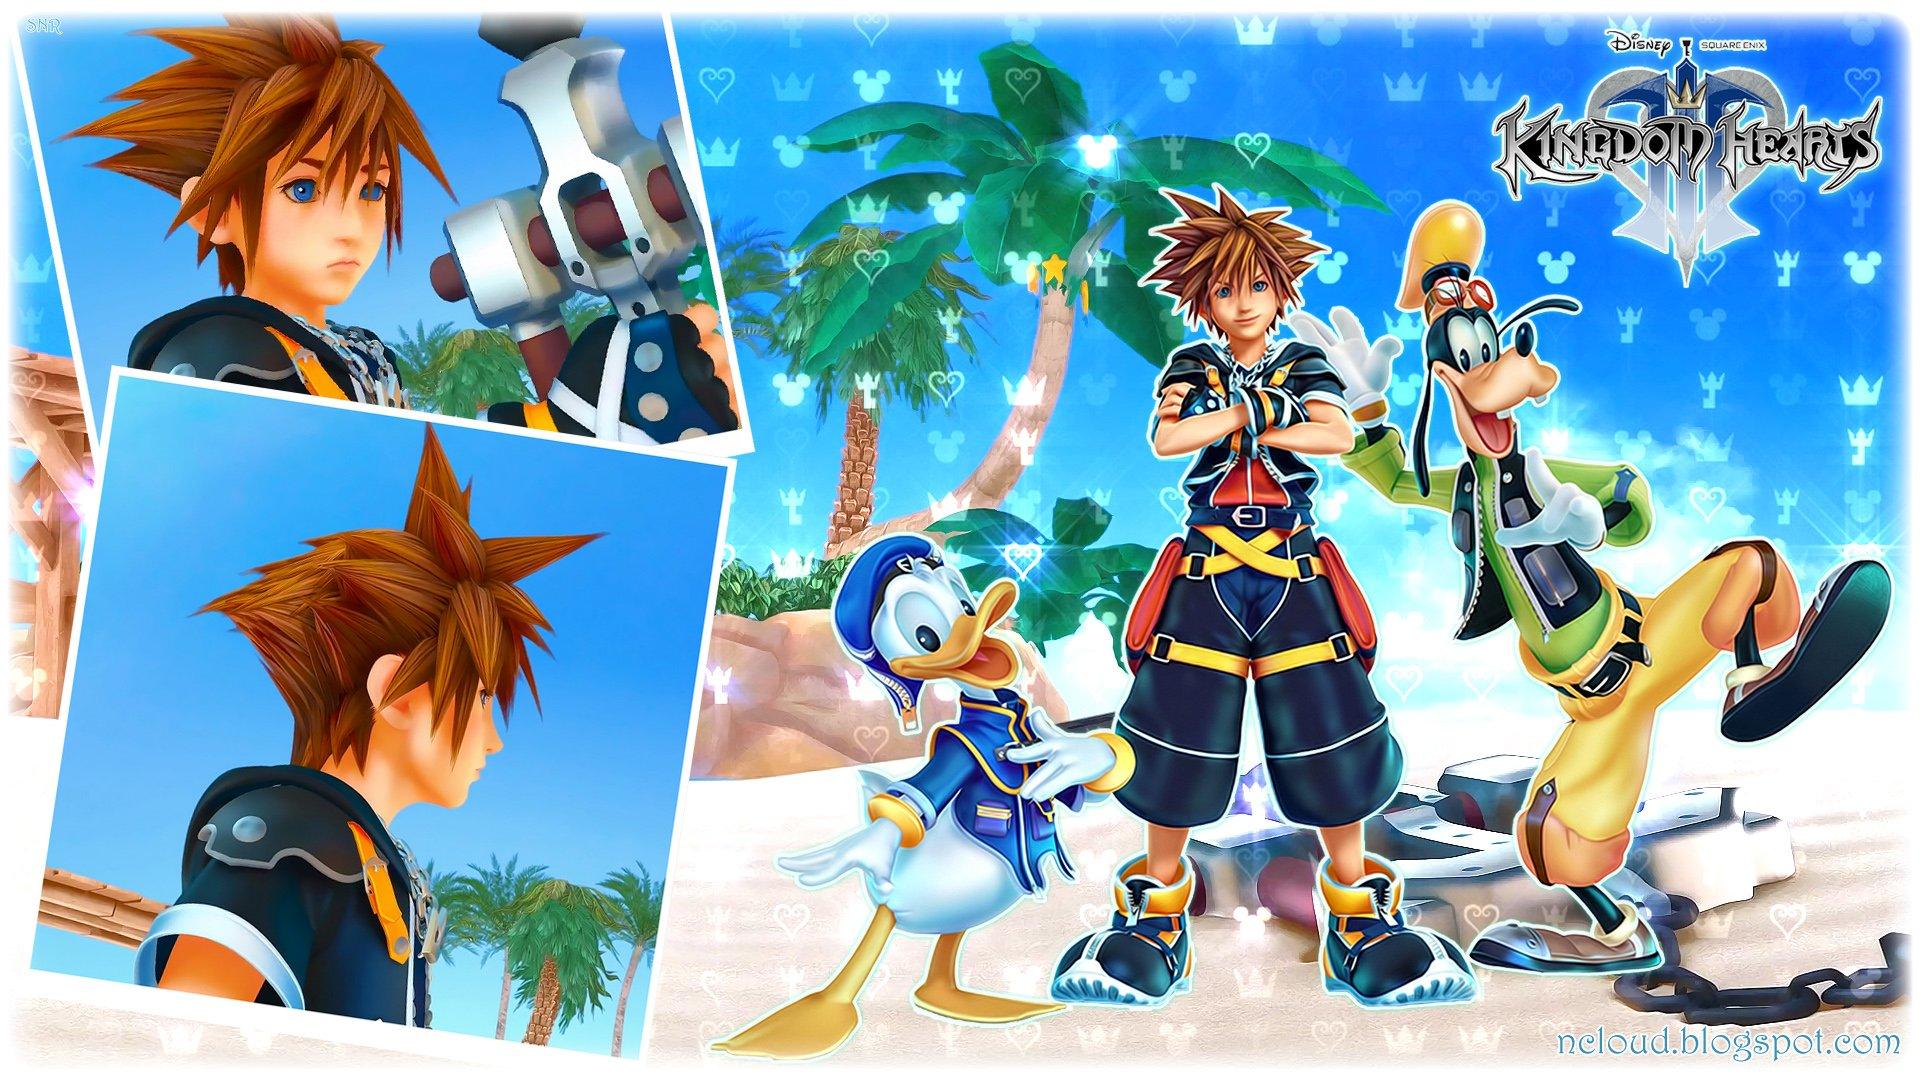 Games Movies Music Anime My Kingdom Hearts 3 Wallpaper 1920x1080